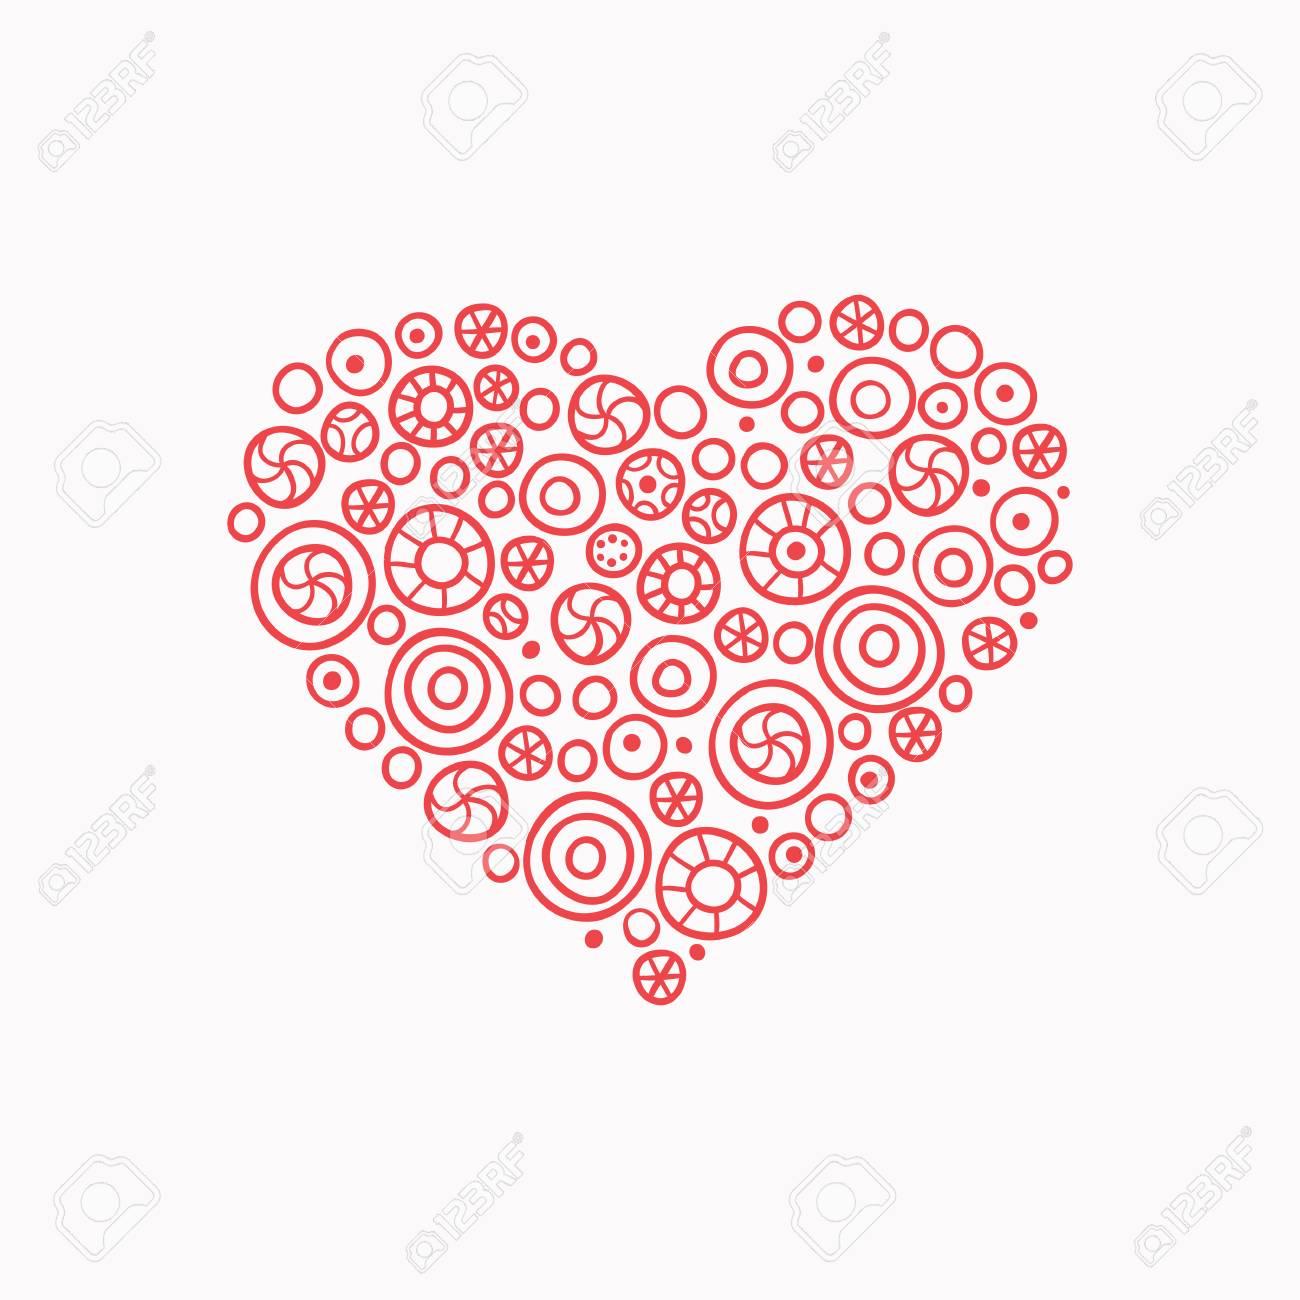 Hand Drawn Cute Fun Pink Heart Valentine Day Heart Royalty Free